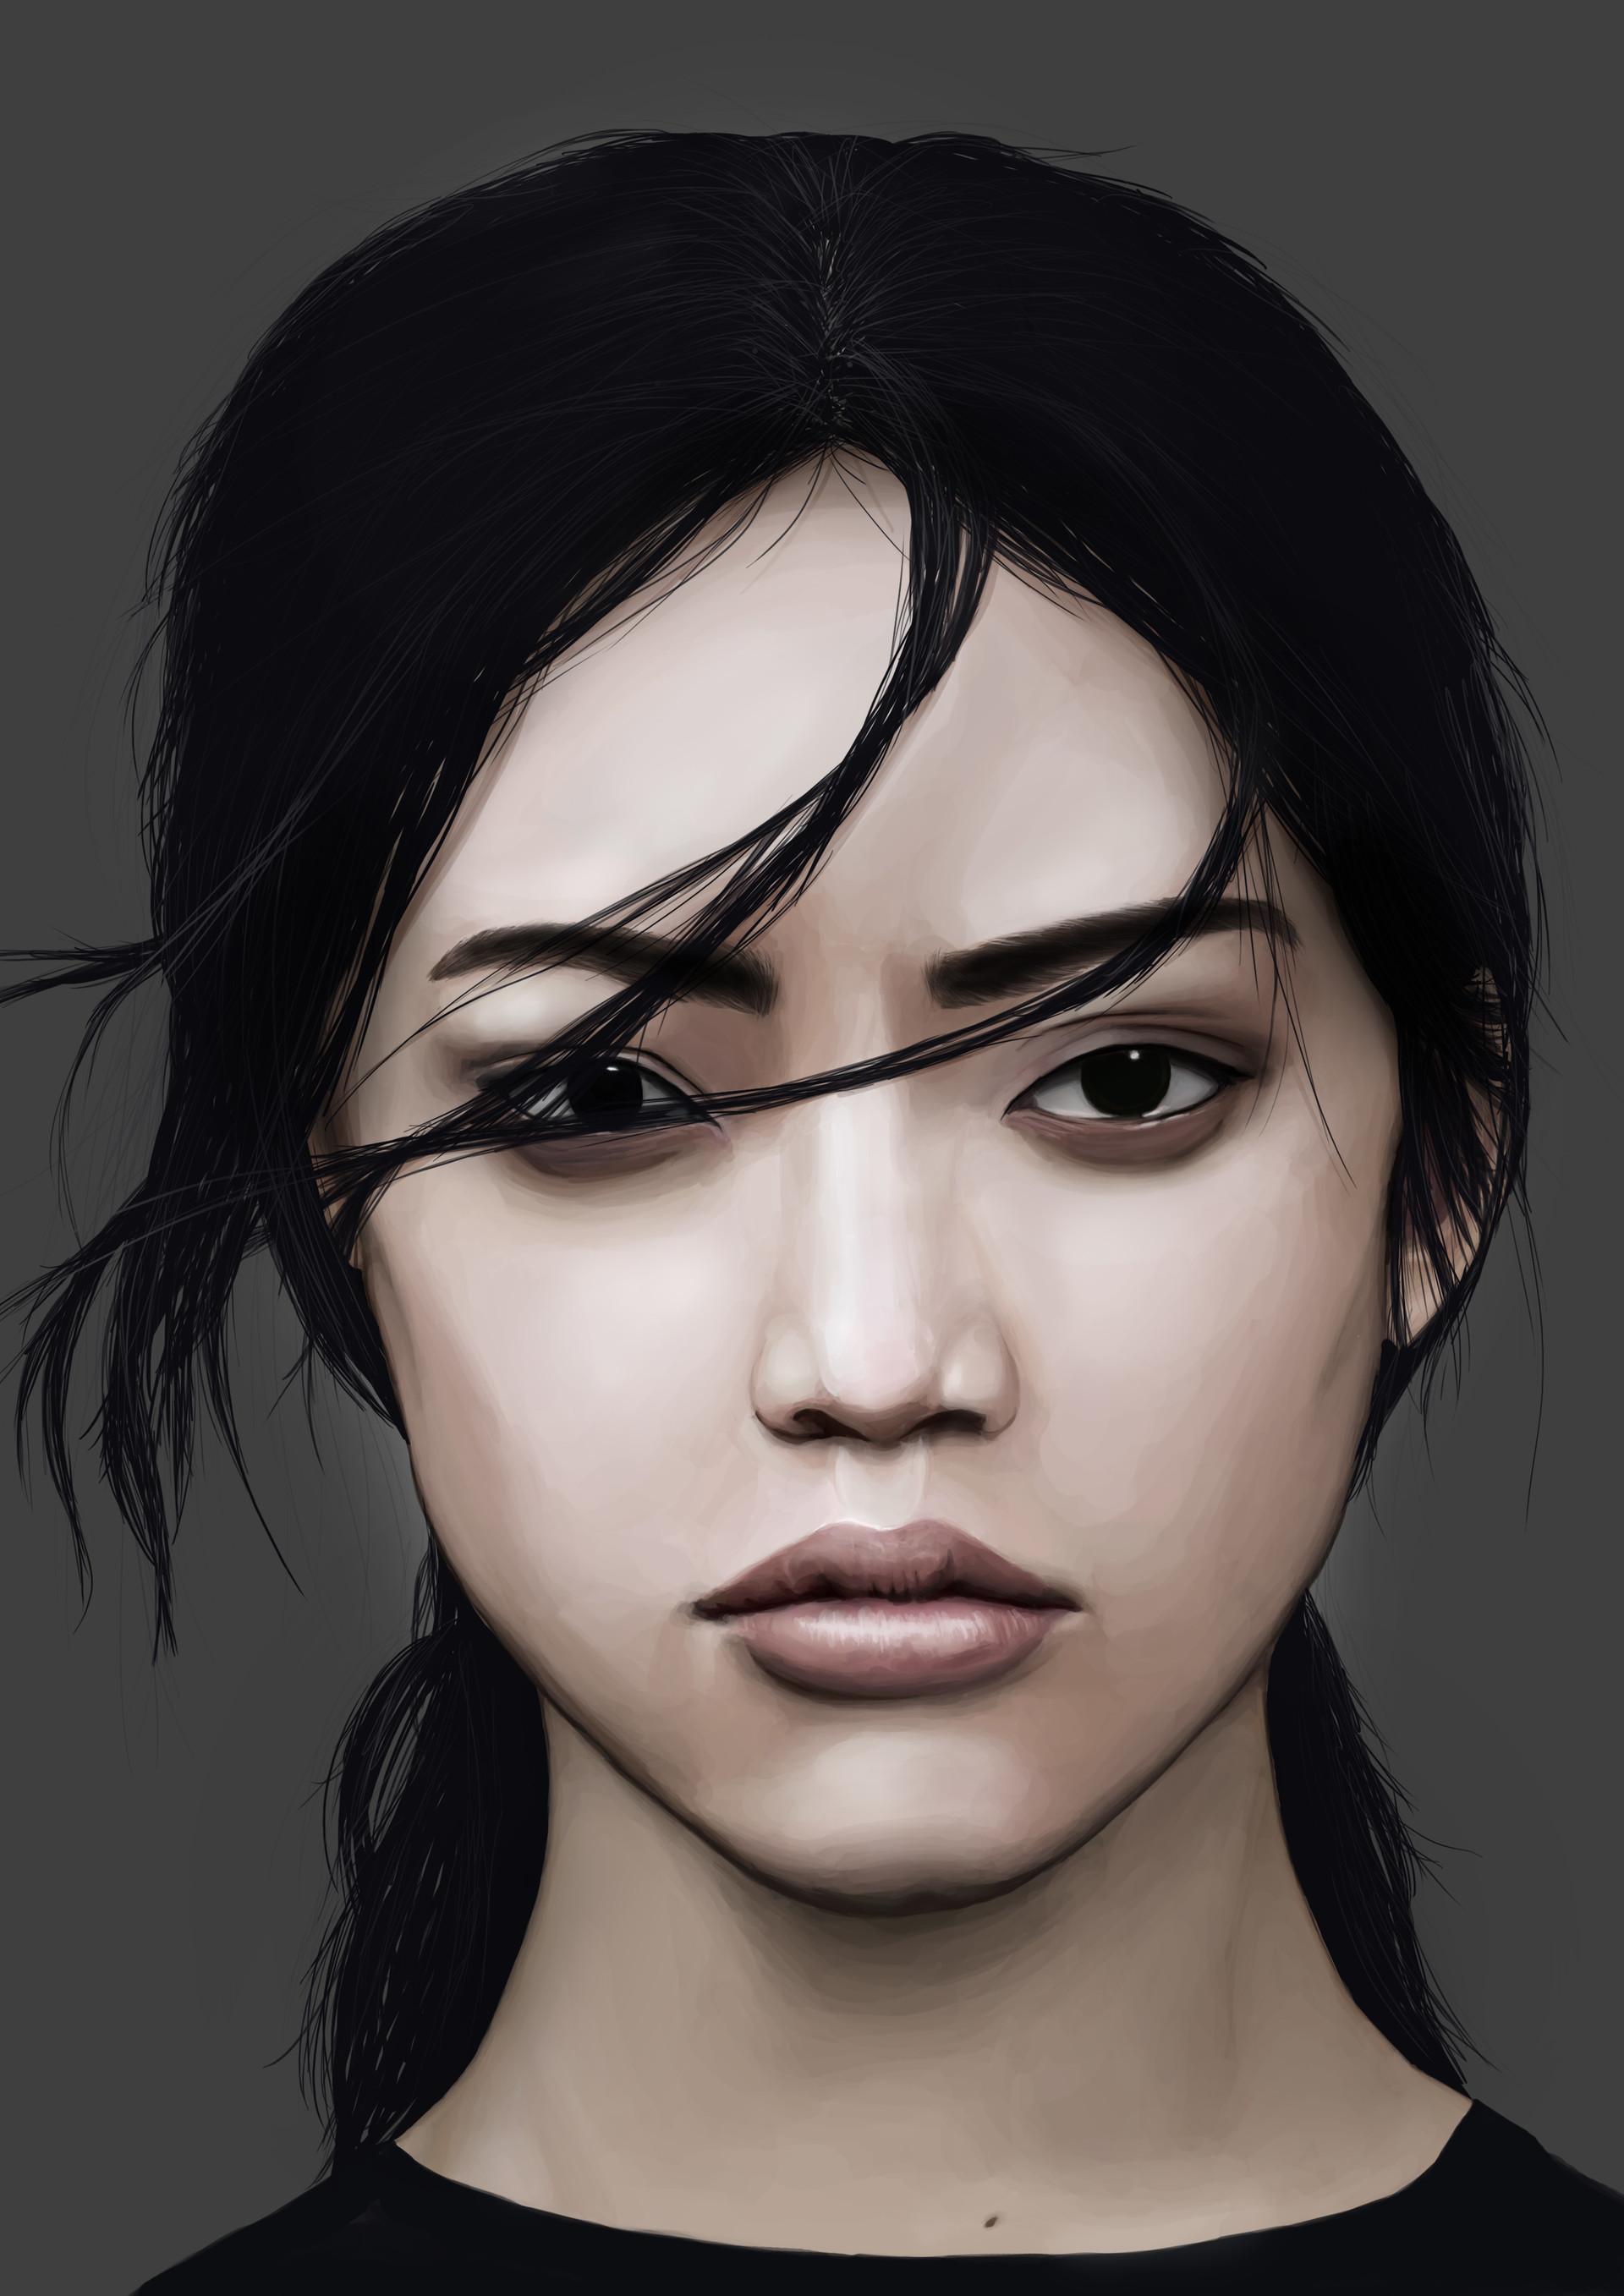 Something is. Asian model photo woman amusing